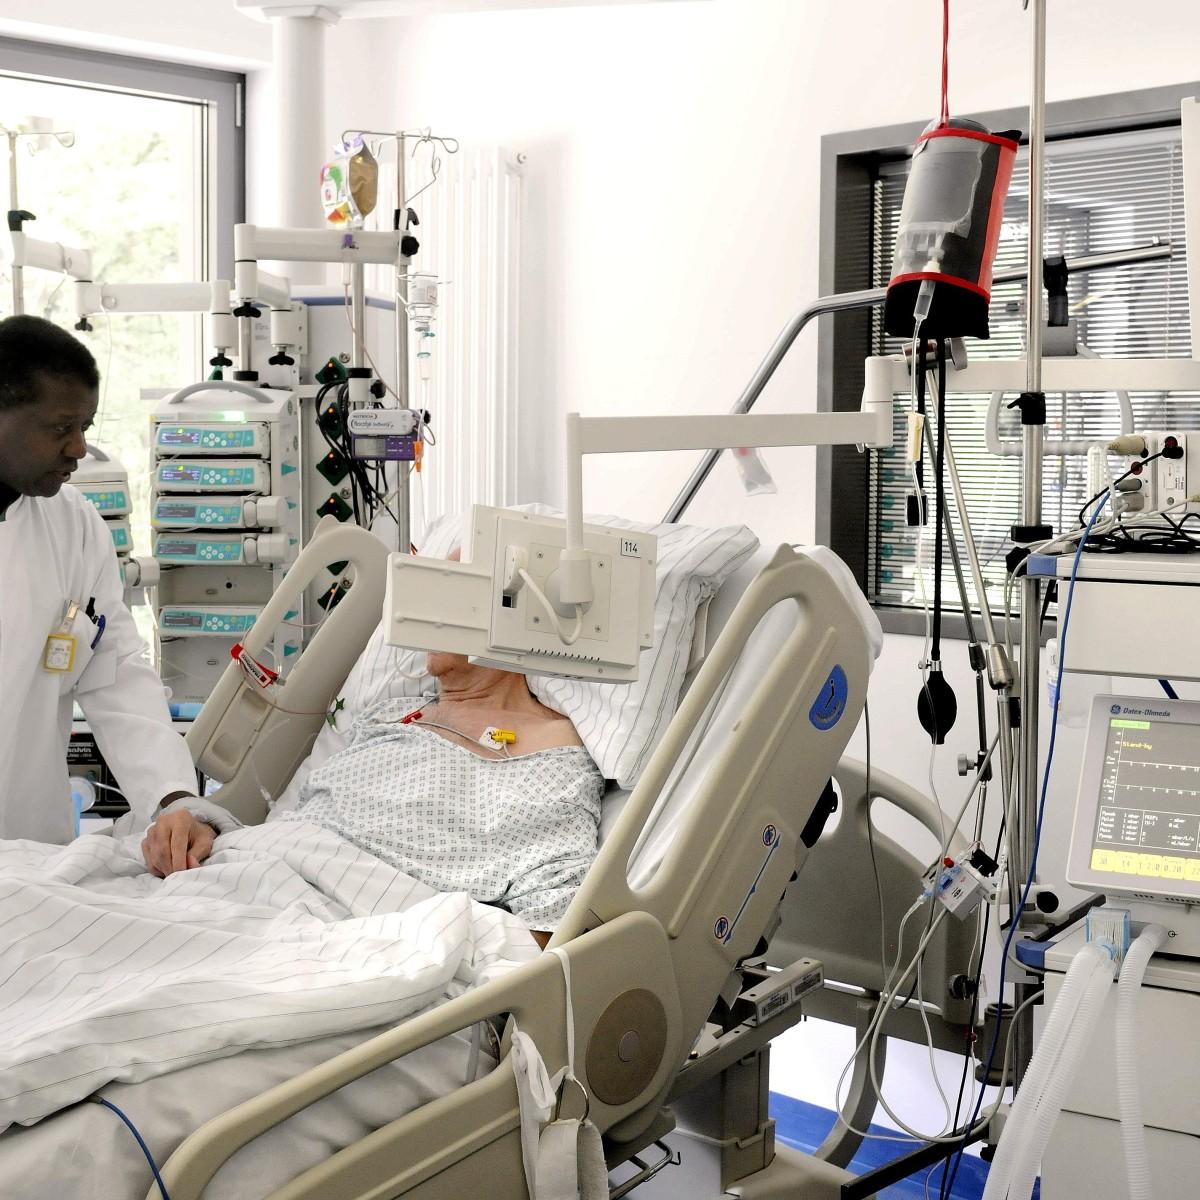 Krankenhaus sex Kostenloses krankenhaus